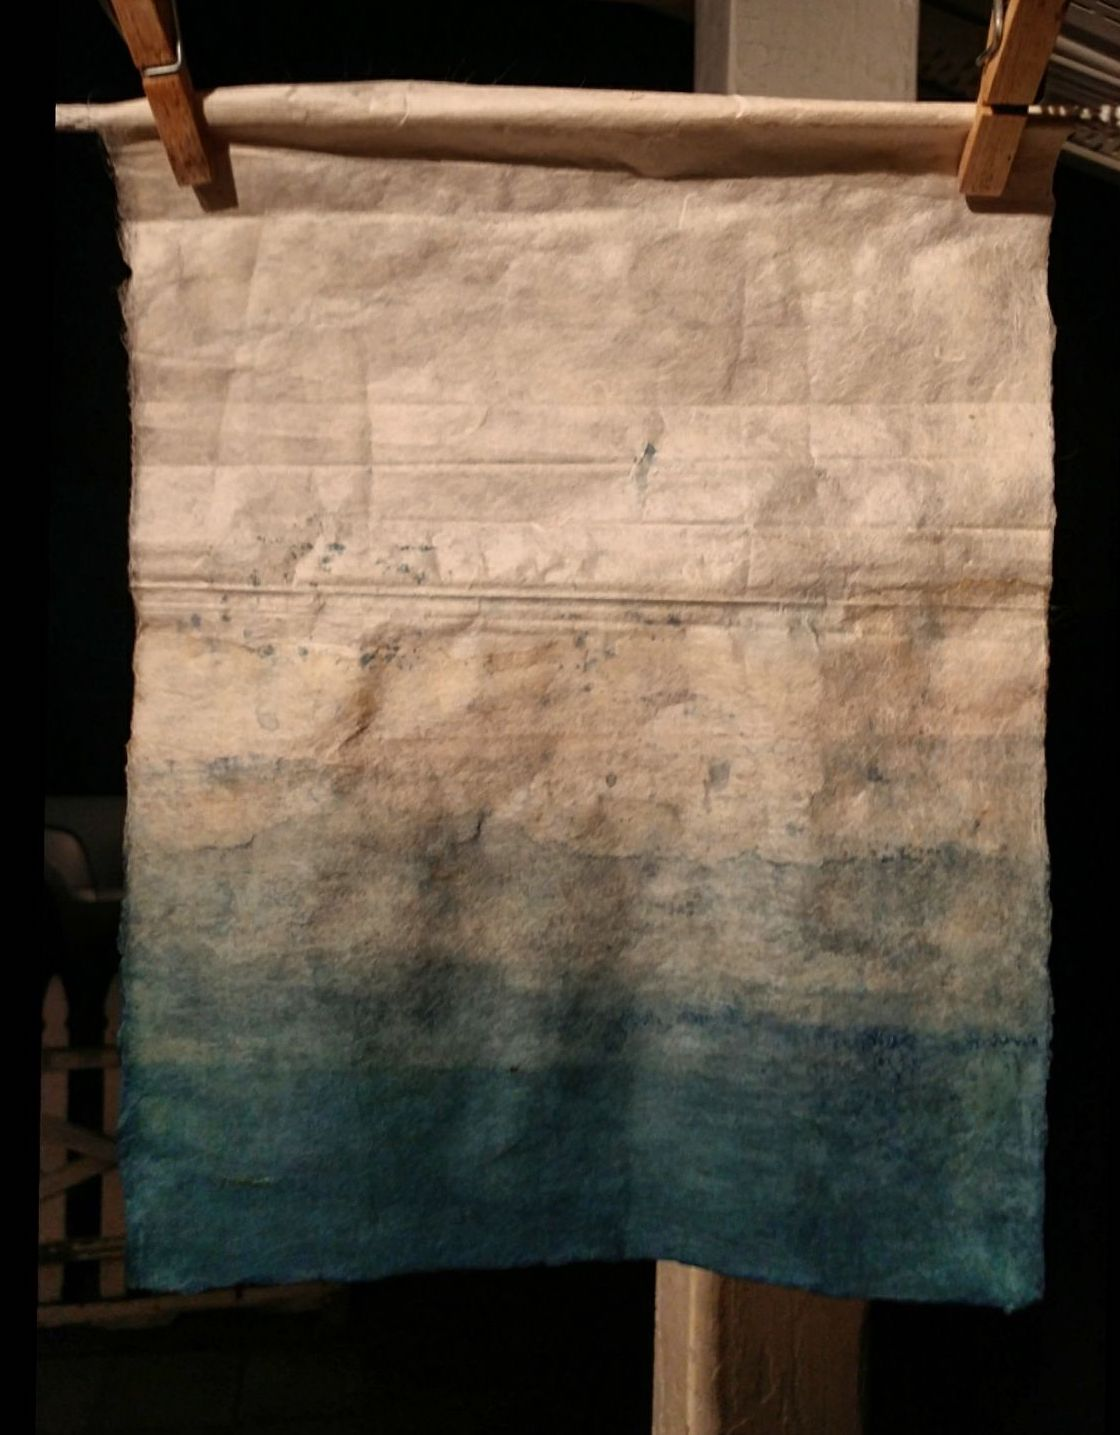 Handmade kozo paper dip-dyed in indigo.